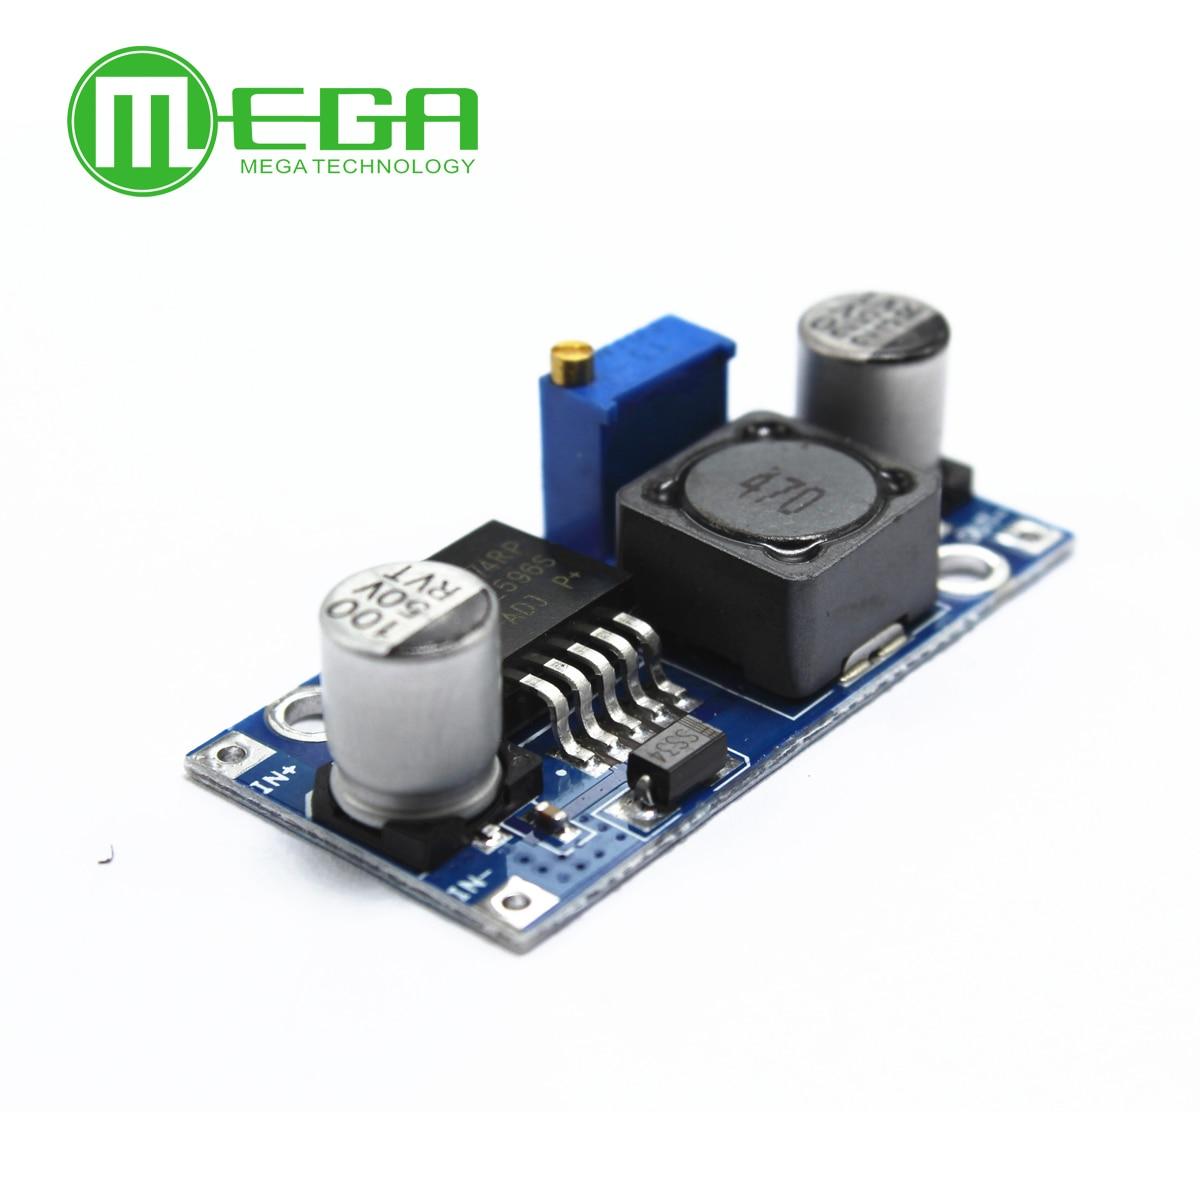 50pcs Lot Lm2596s Lm2596 Dc Step Down Module 5v 12v 24v Circuits Apmilifier To Lm2577 Converter Up Voltage 3 40v Adjustable Power Supply New